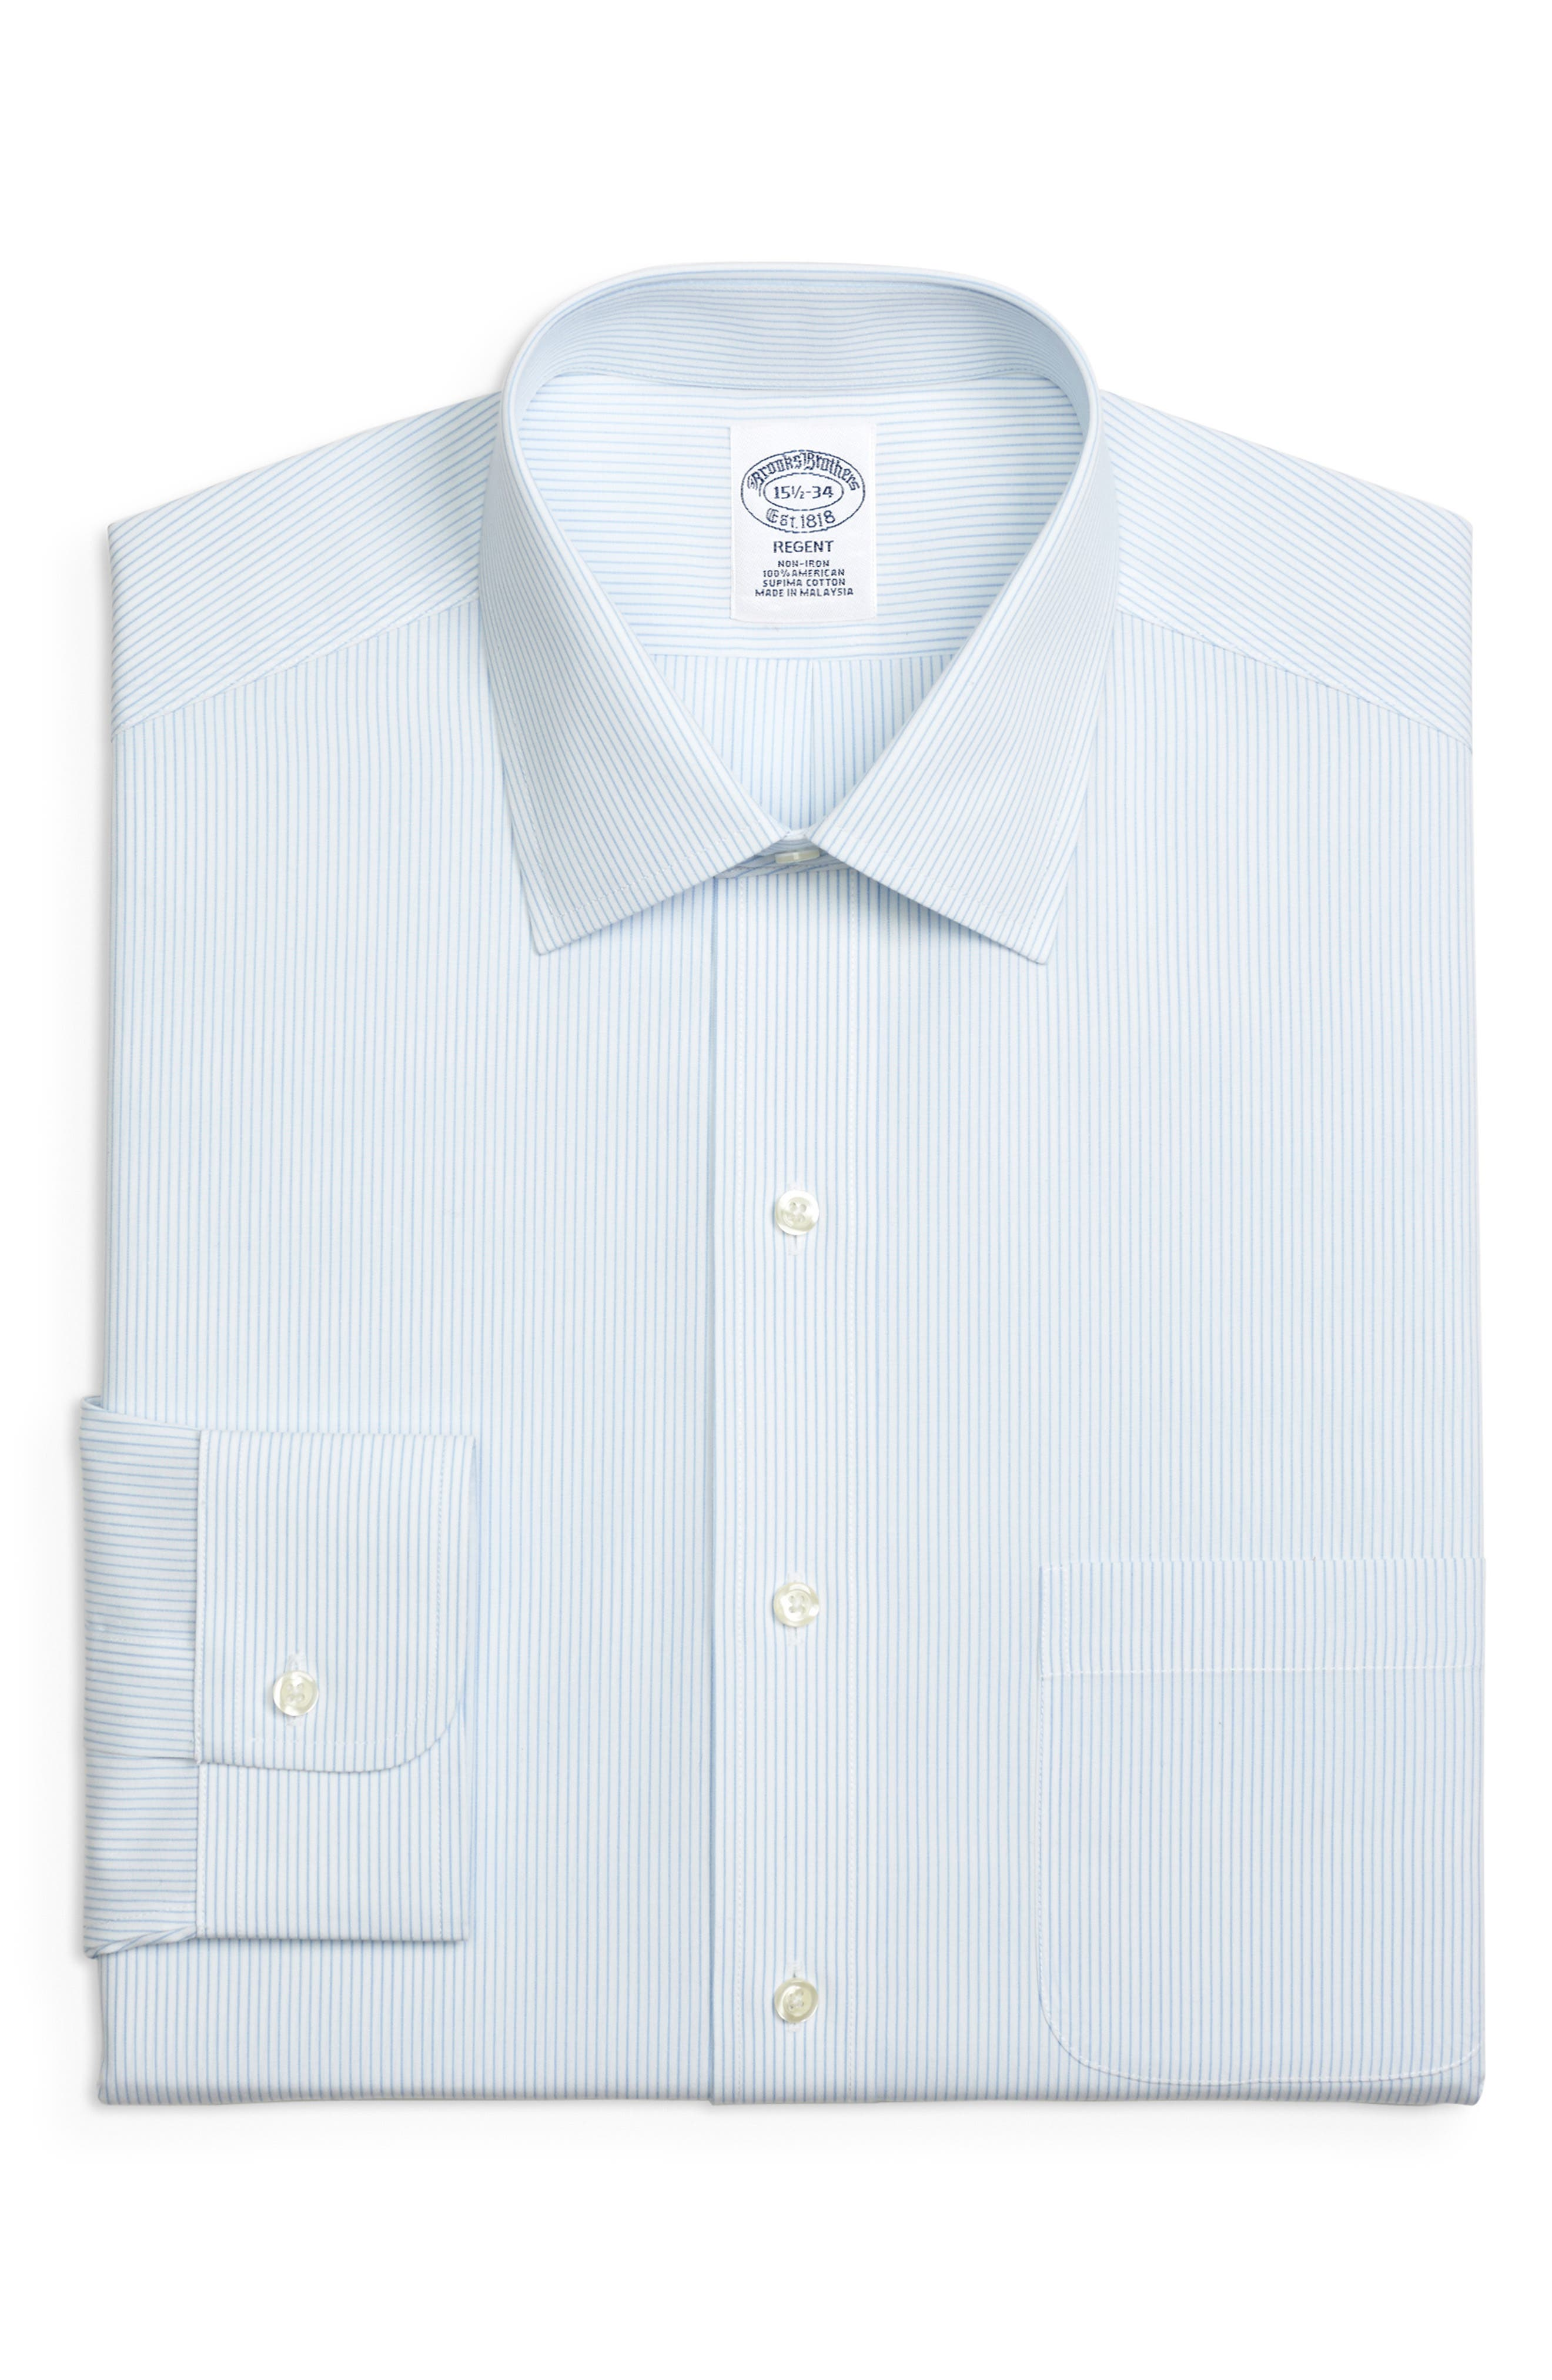 Regular Fit Stripe Dress Shirt,                         Main,                         color, LIGHT/ PASTEL BLUE